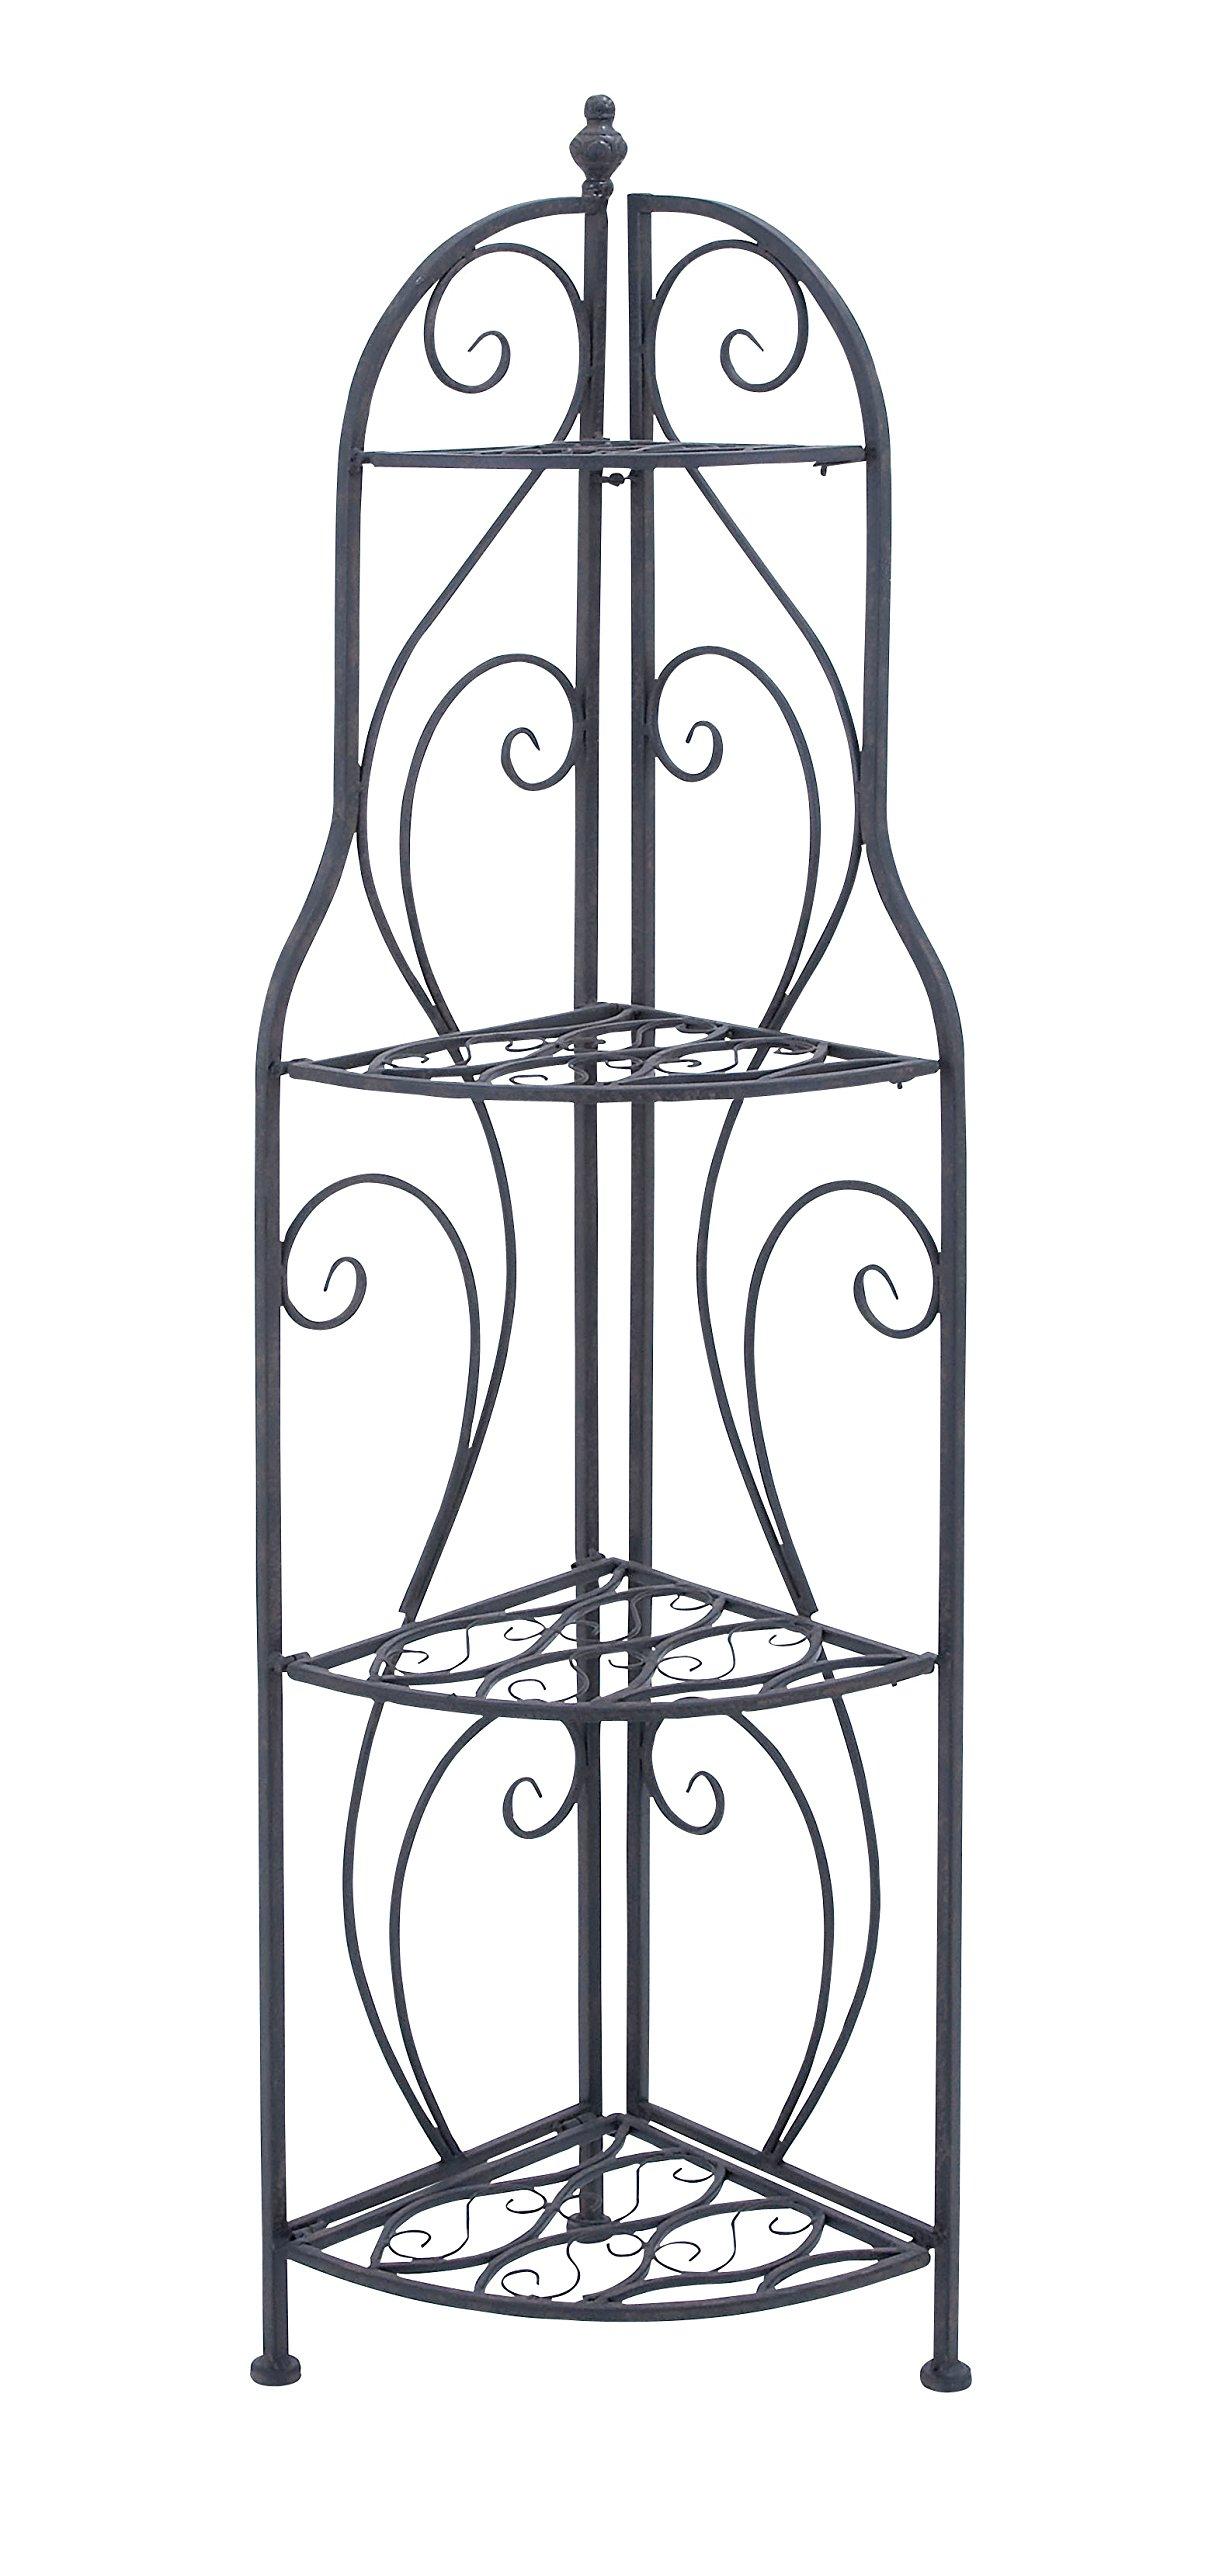 Deco 79 Metal Corner Rack Home Decor Product, 60''H/17''W by Deco 79